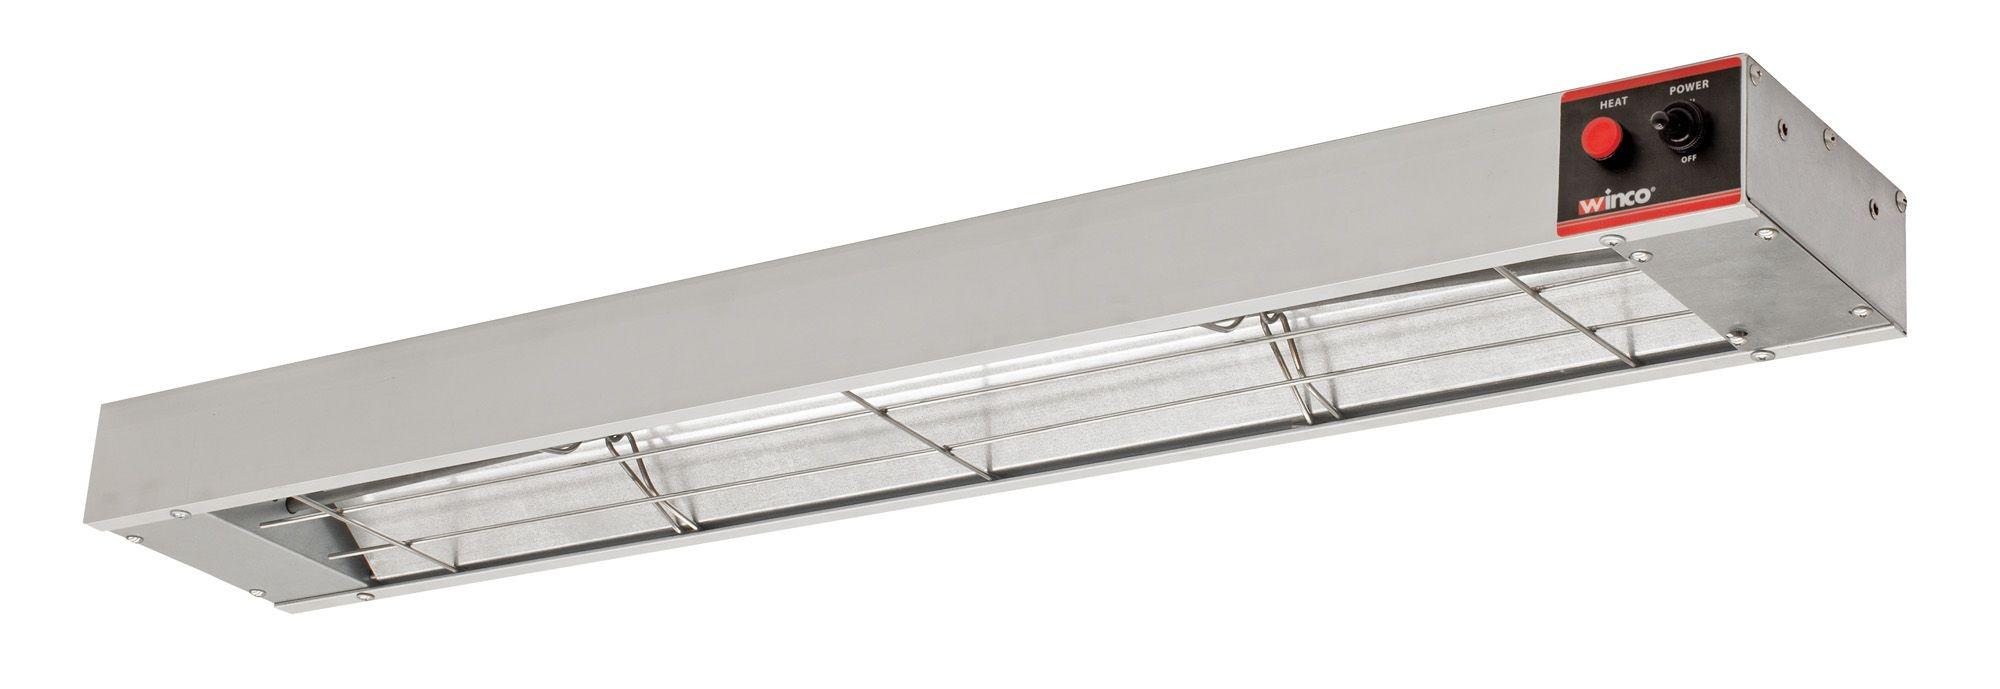 "Winco ESH-36 36"" Electric Infrared Strip Heater"